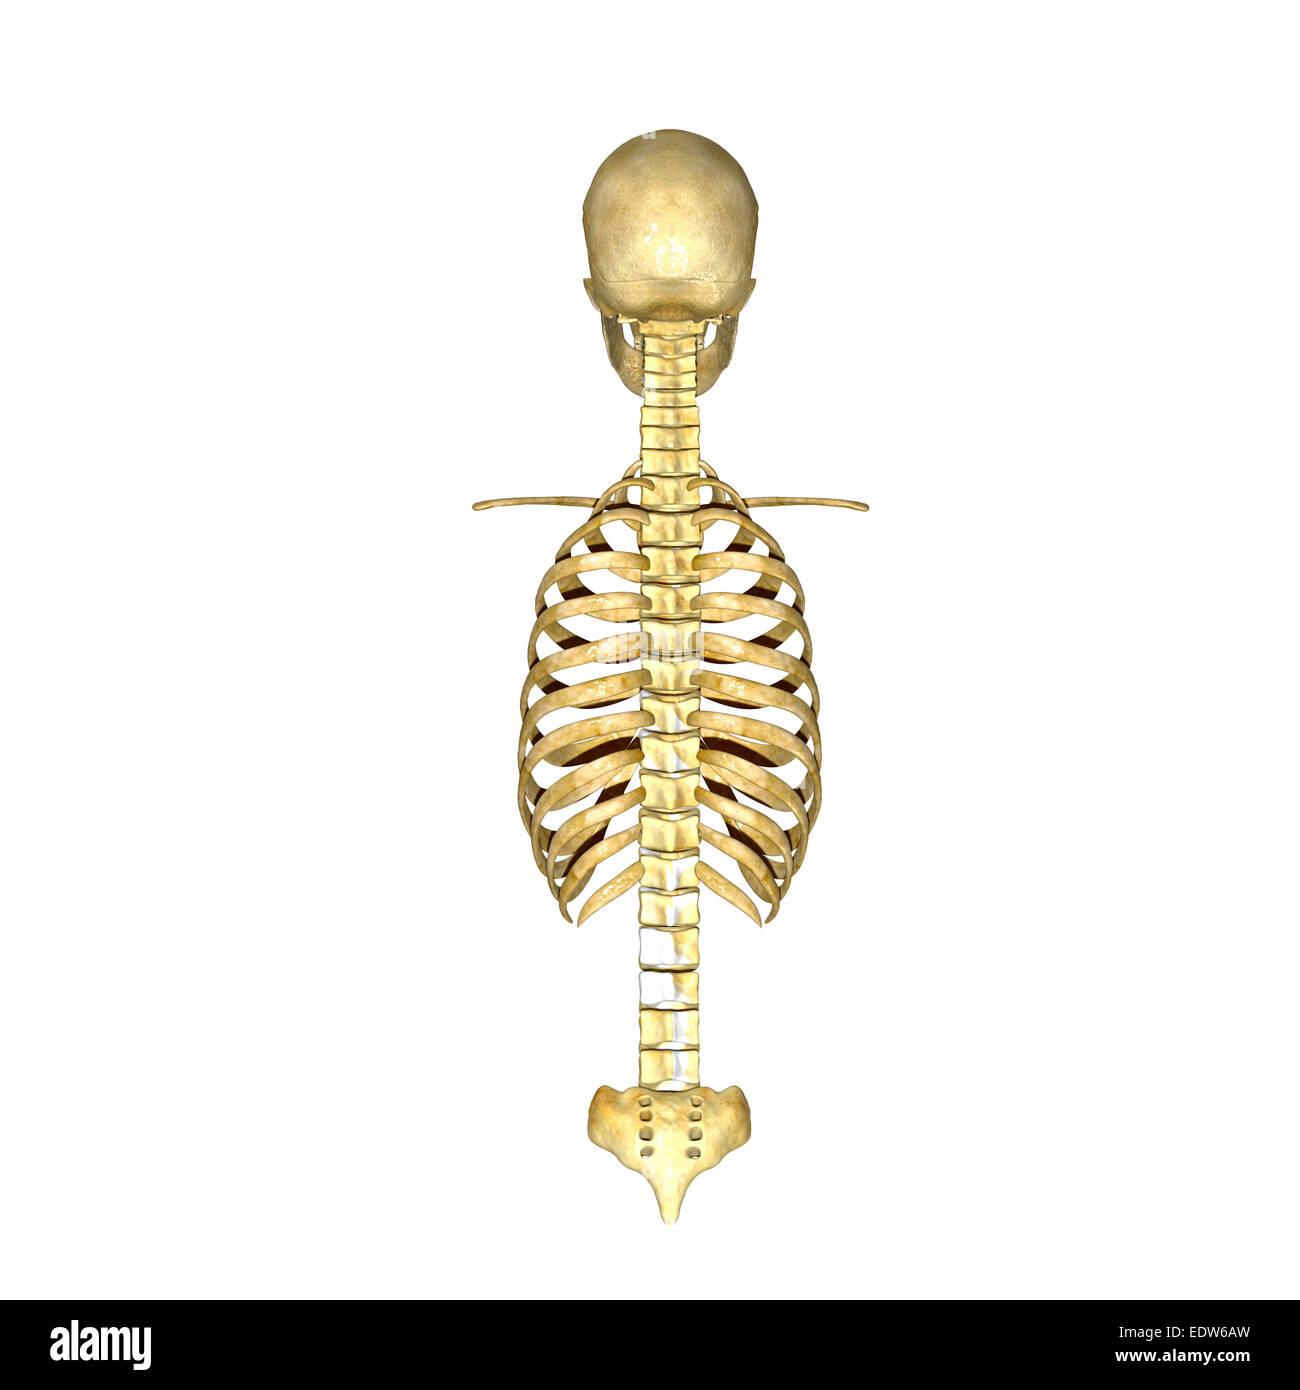 Rib cage spinal cord - Stock Image